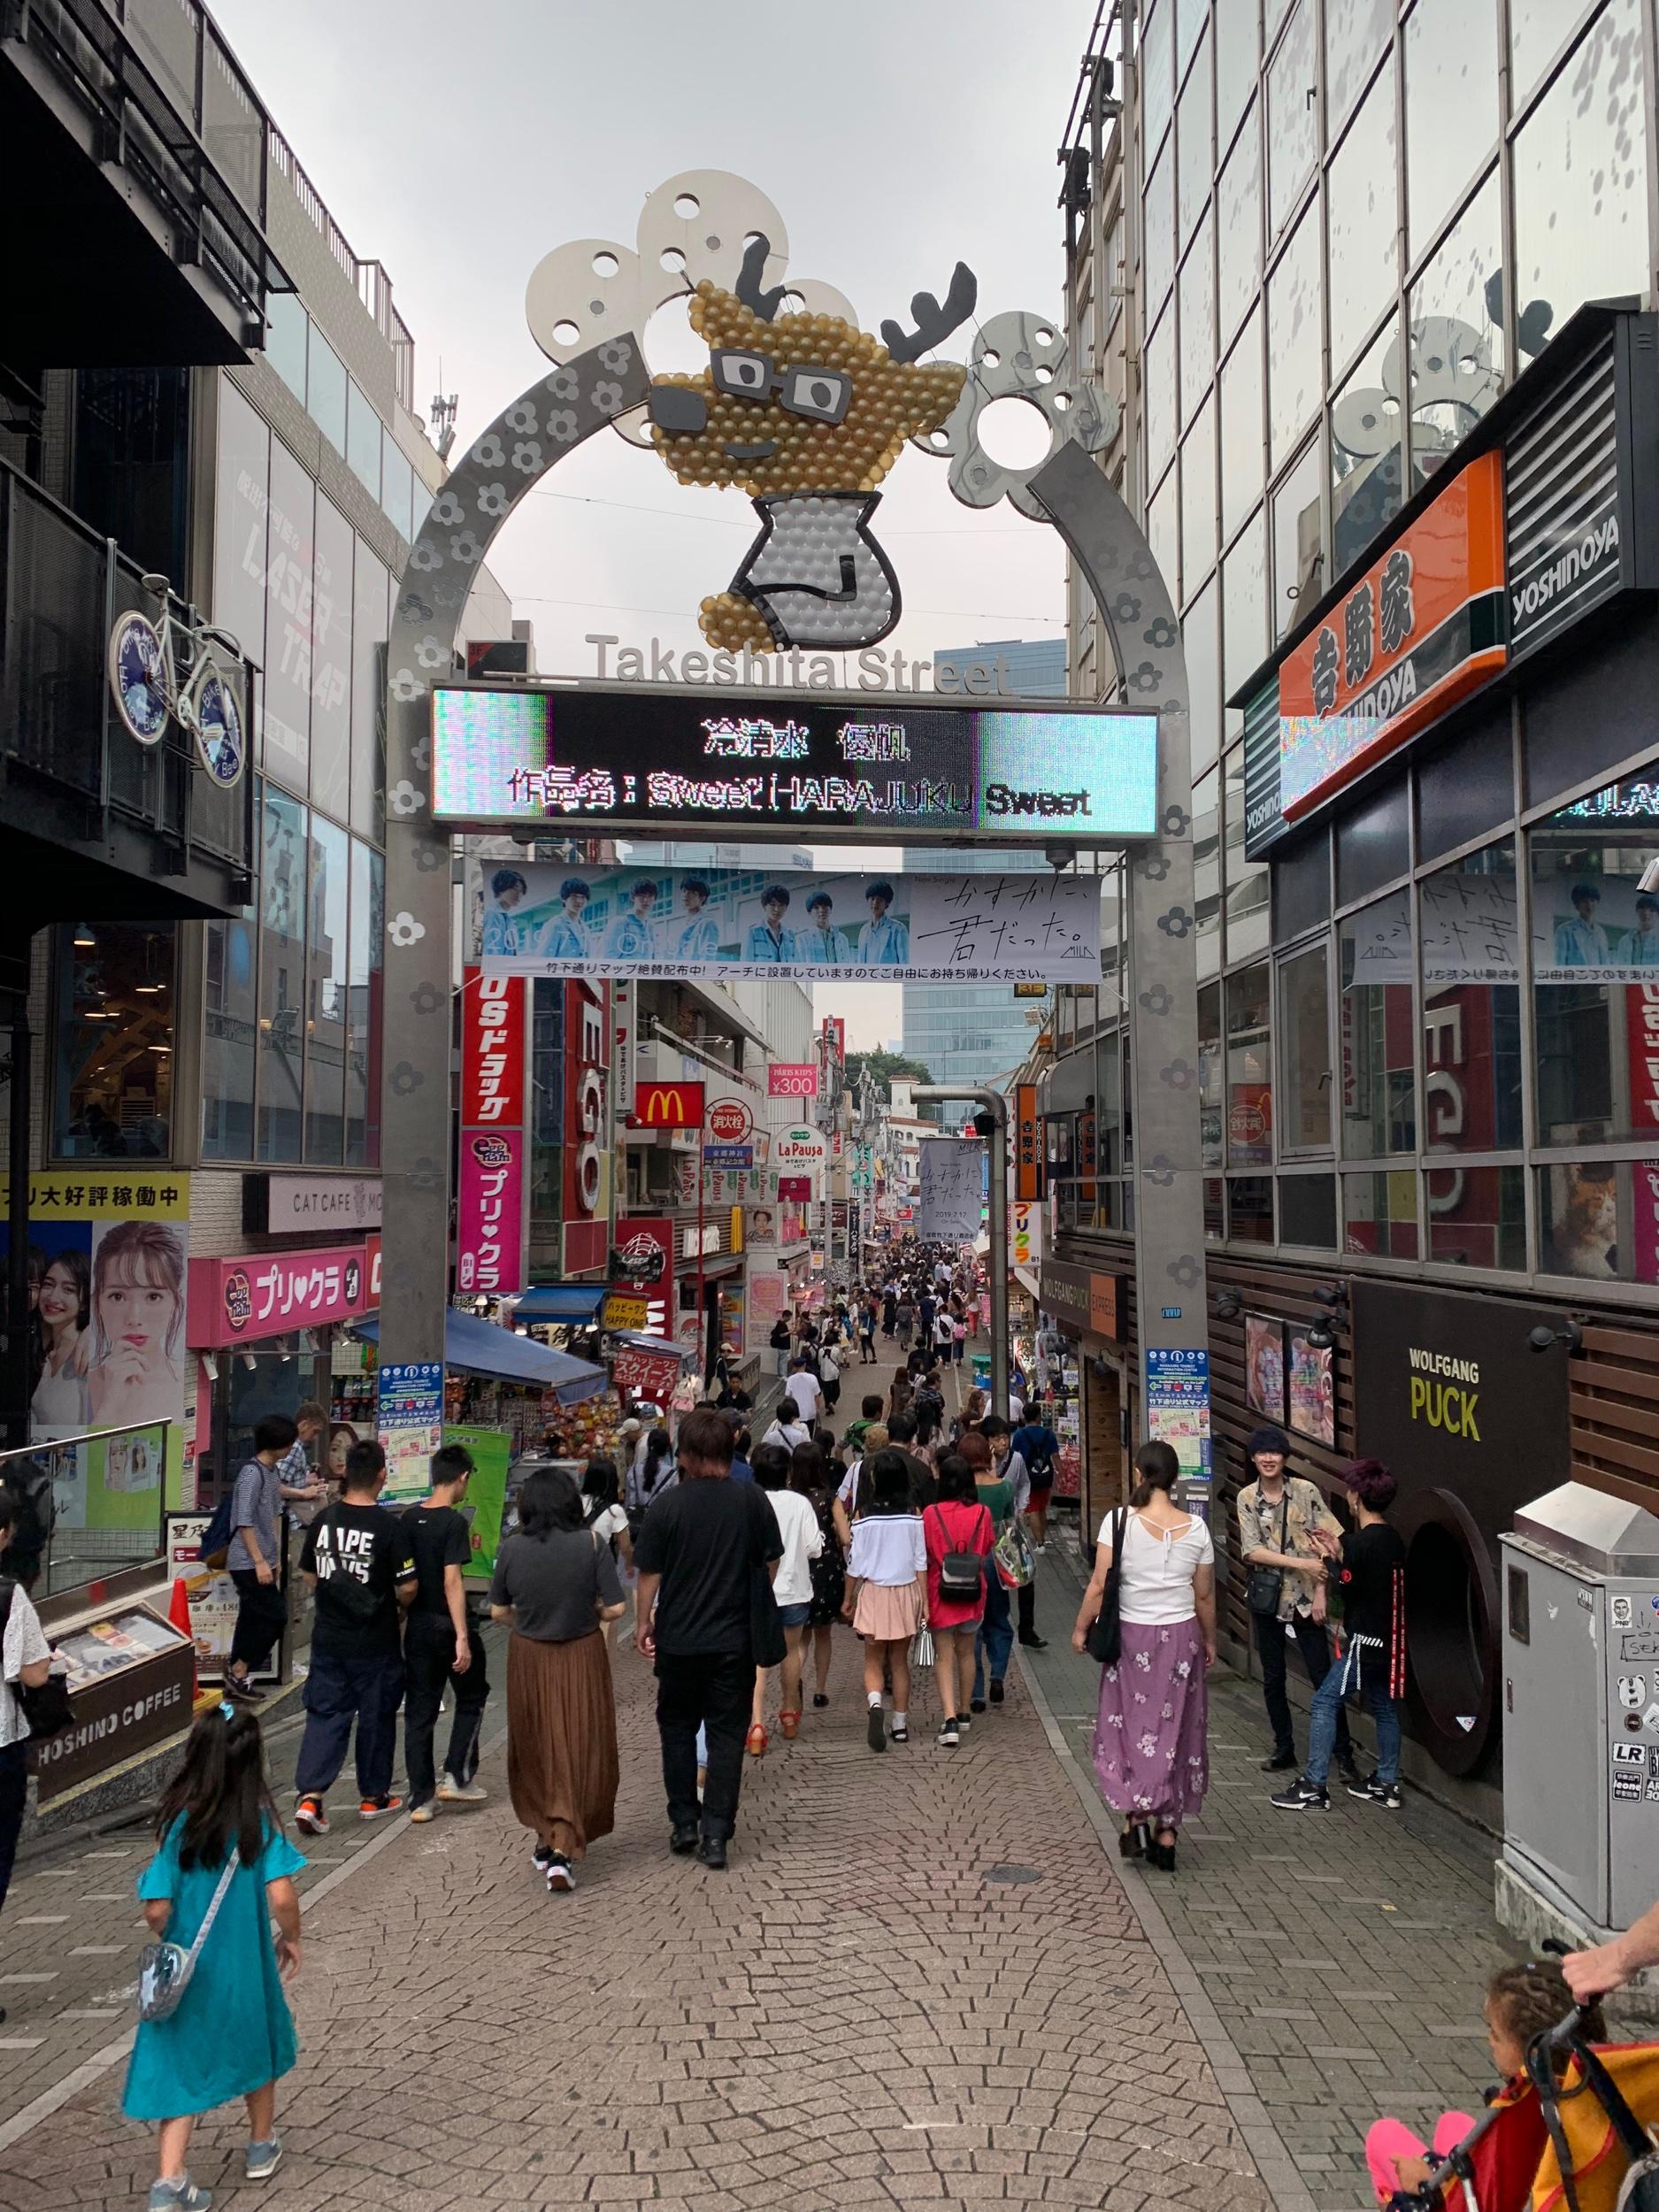 Takashita Street in Harajuku